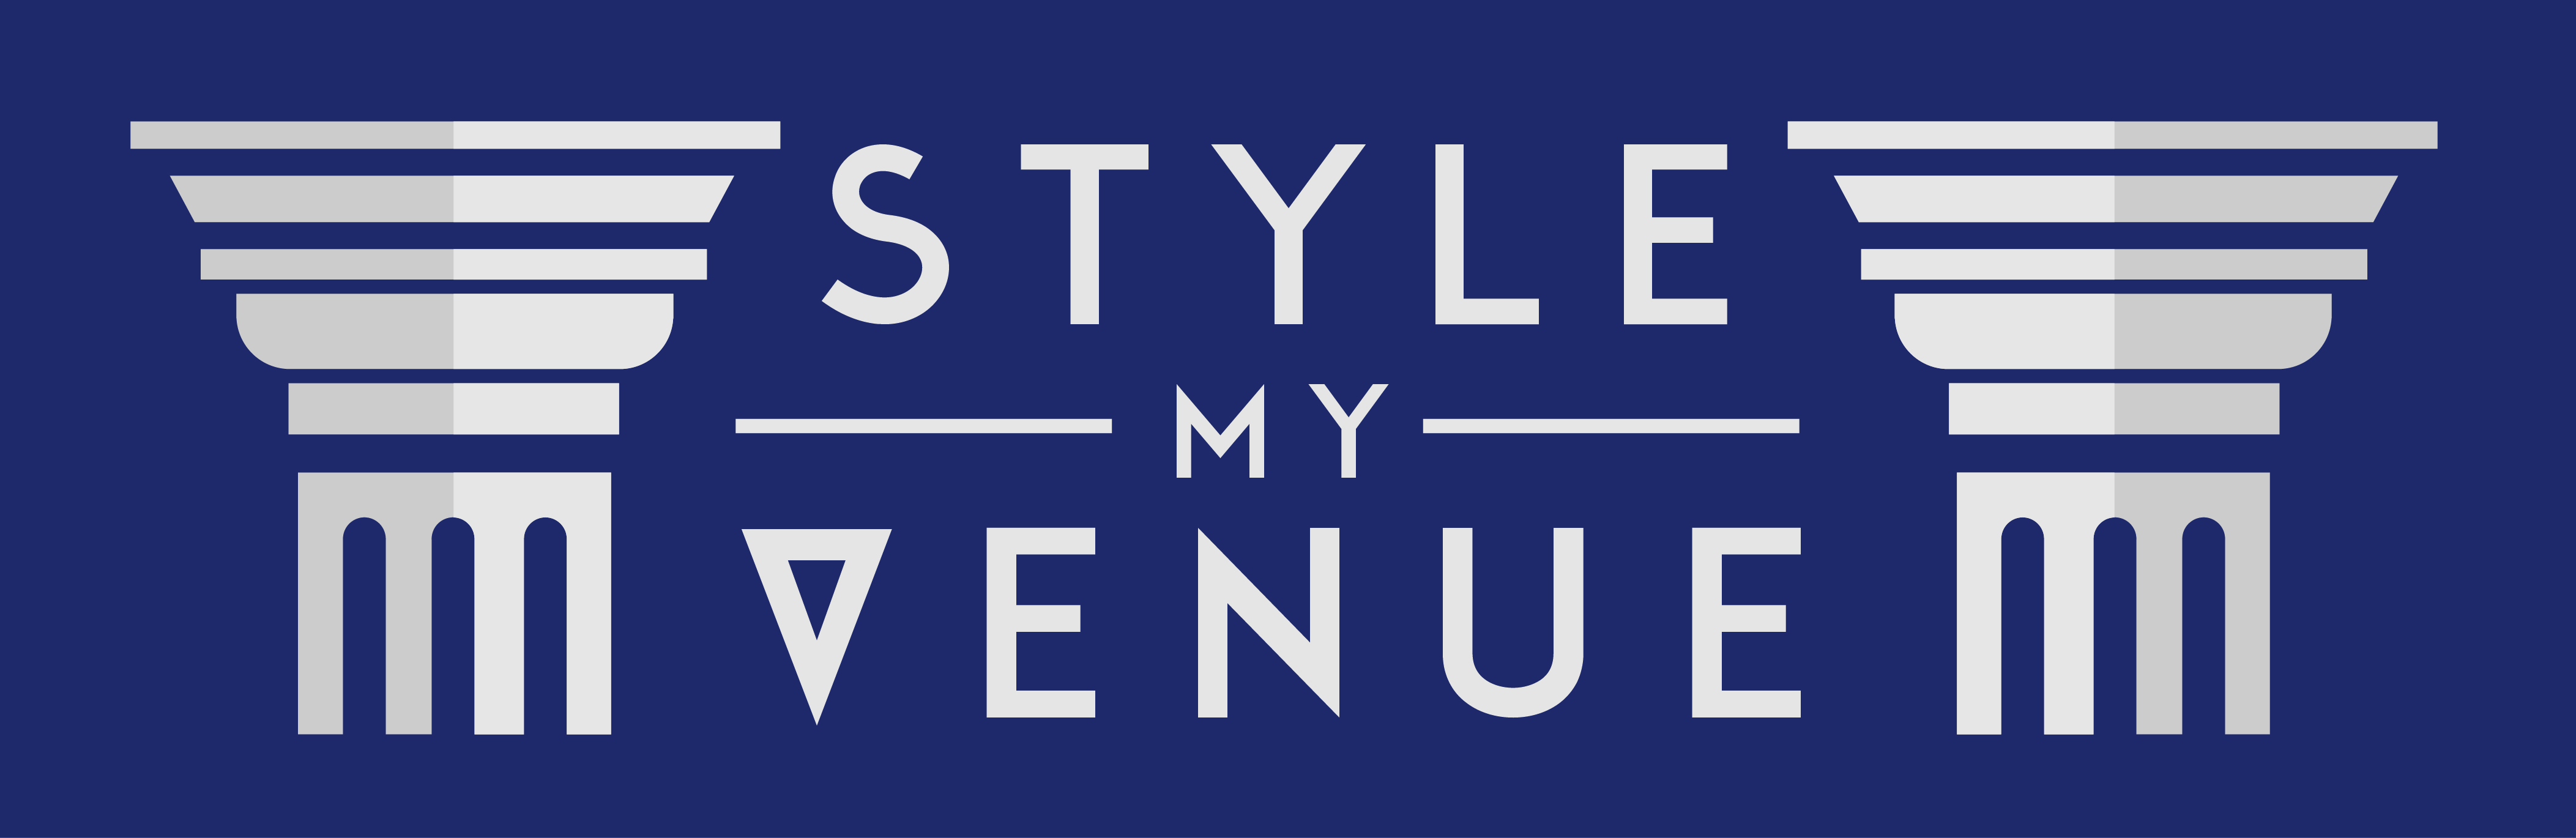 Style My Venue logo